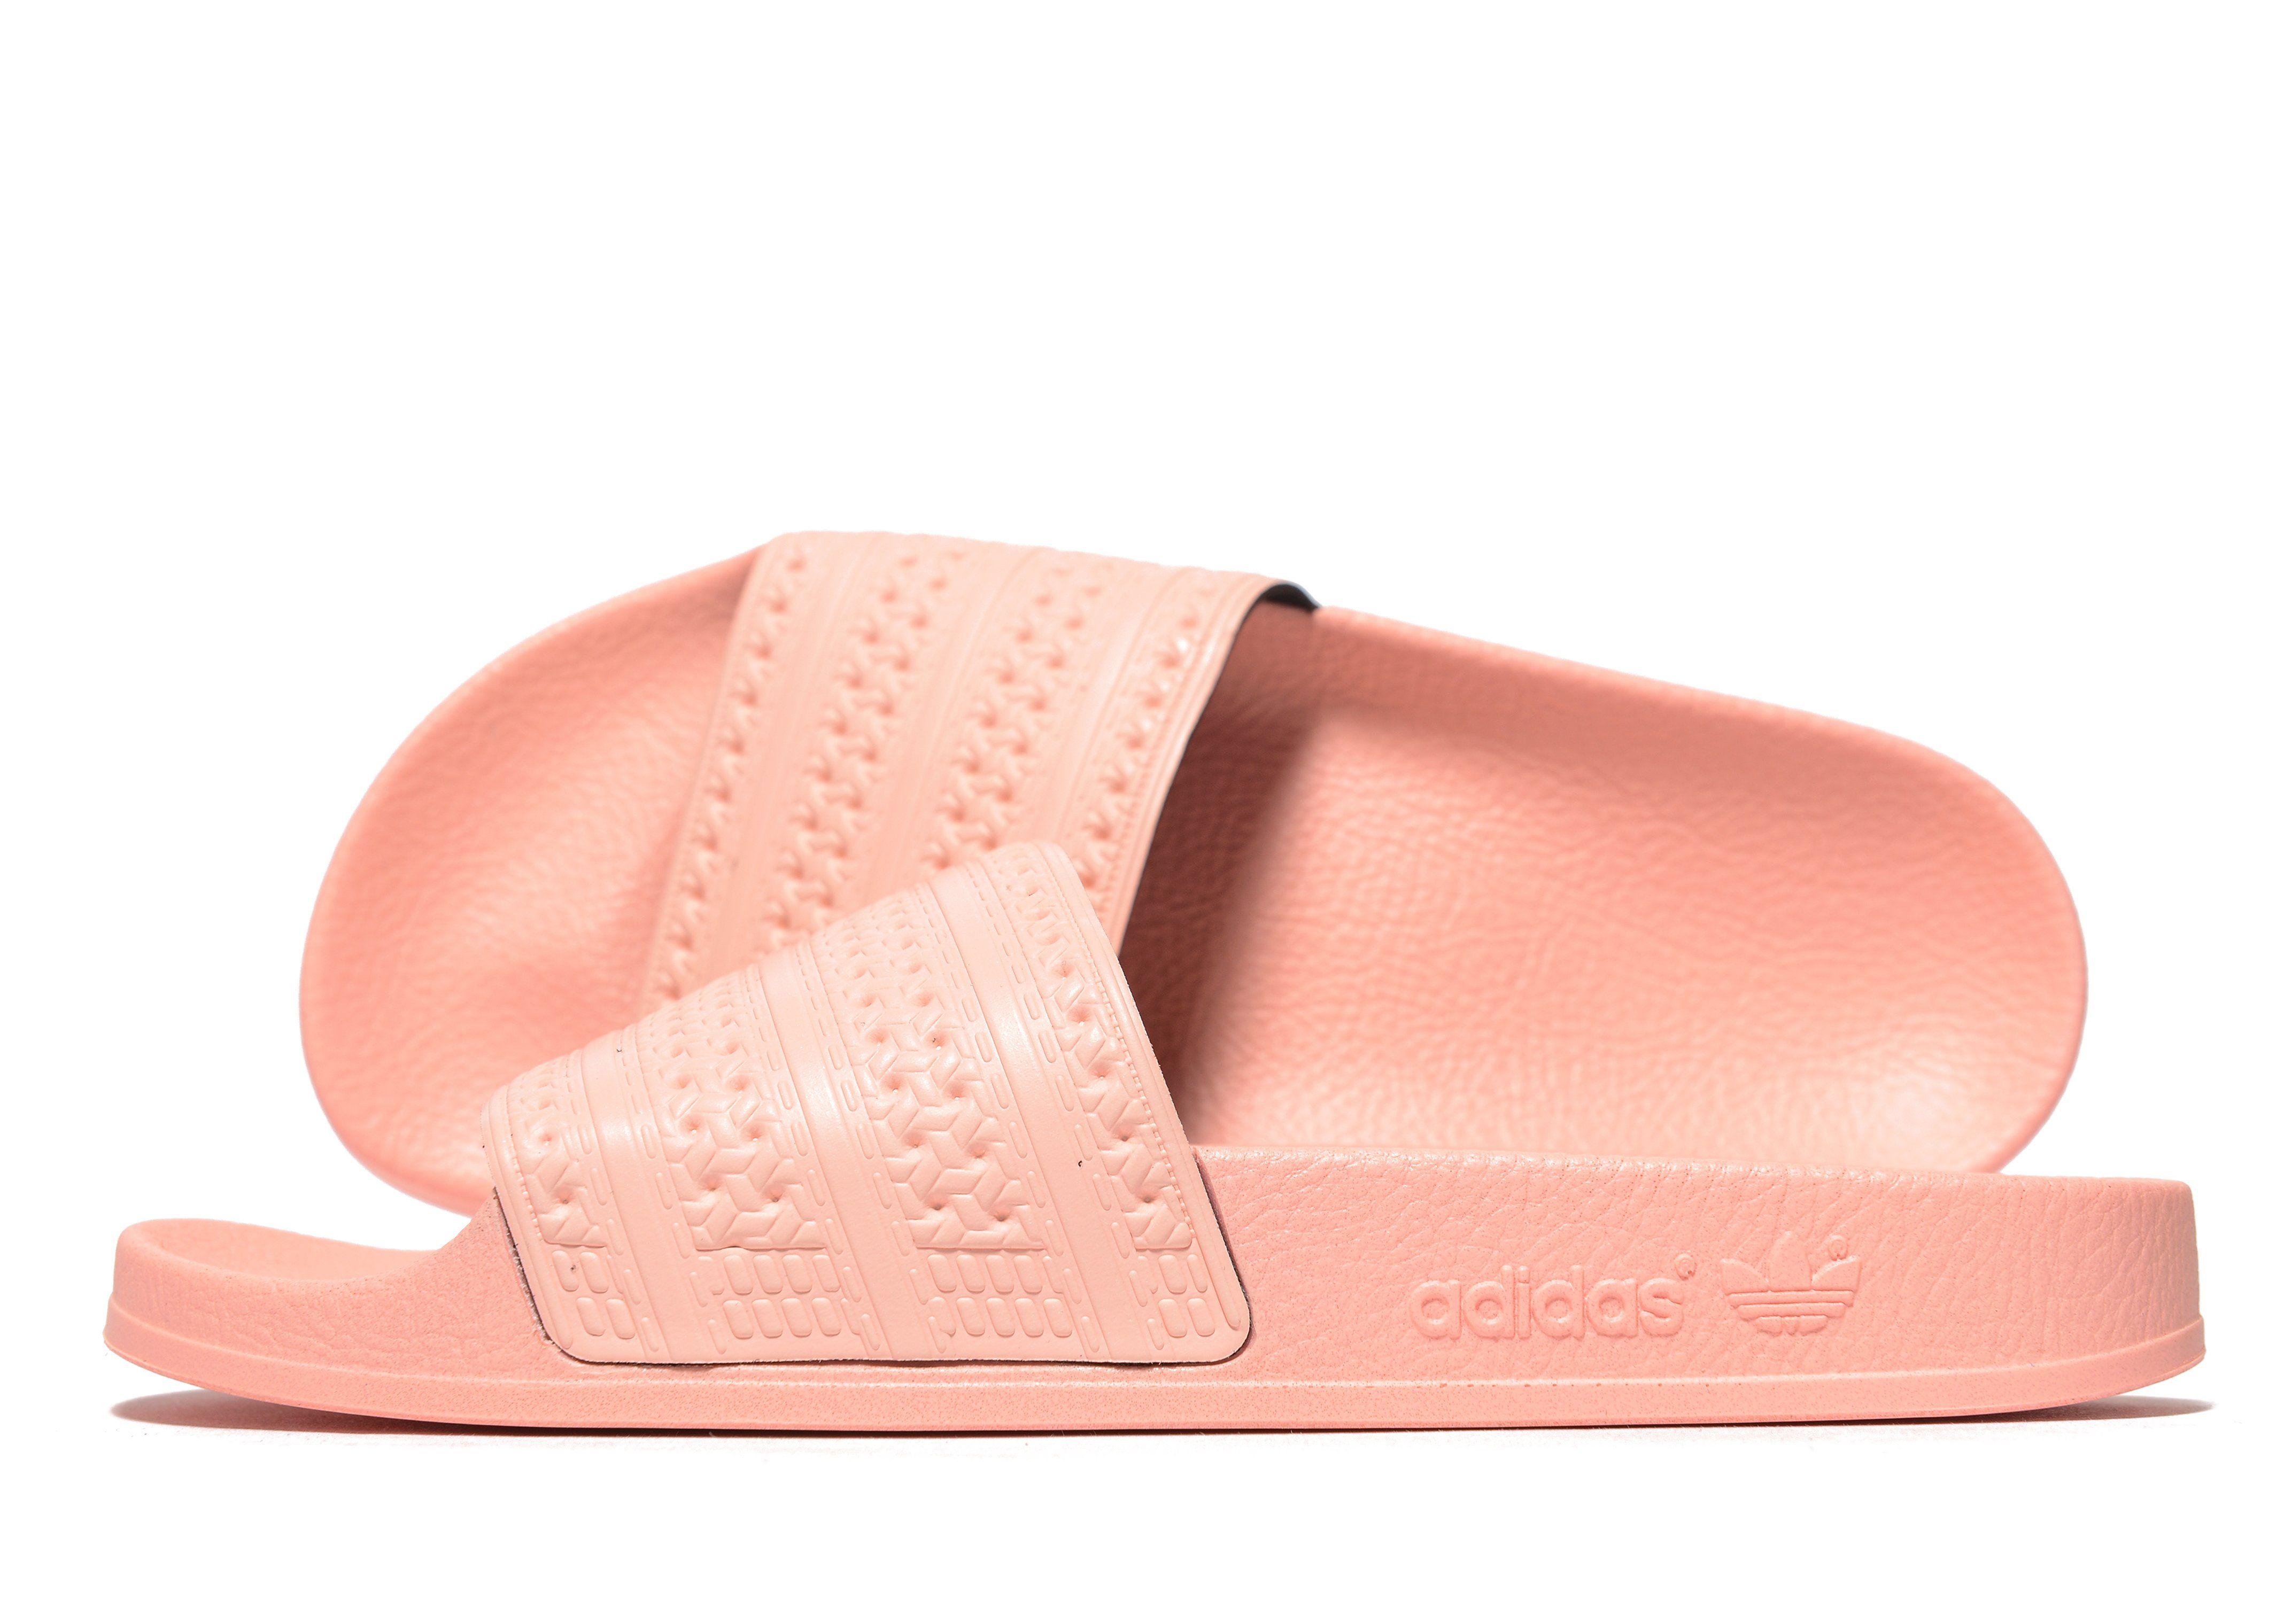 newest a74c0 ee48d adidas Originals Adilette Slides Womens  JD Sports Ireland